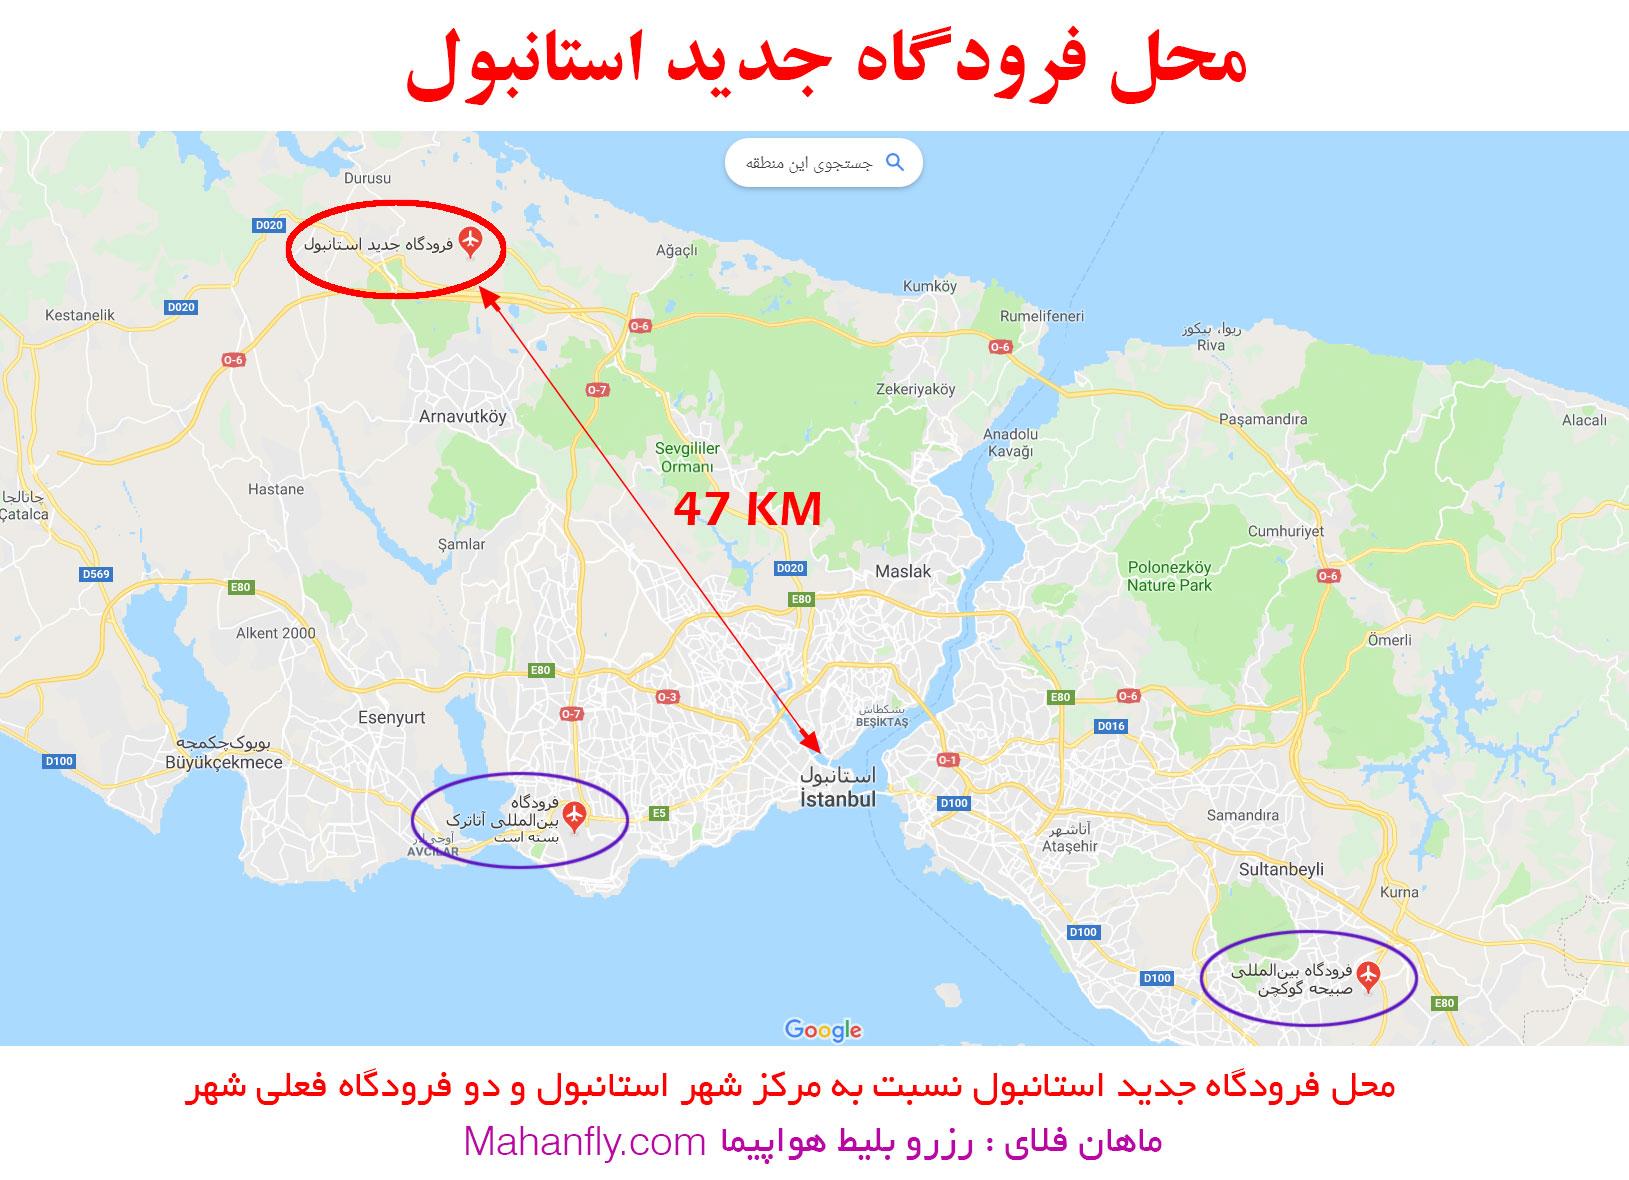 فاصله فرودگاه جدید استانبول تا مرکز شهر استانبول